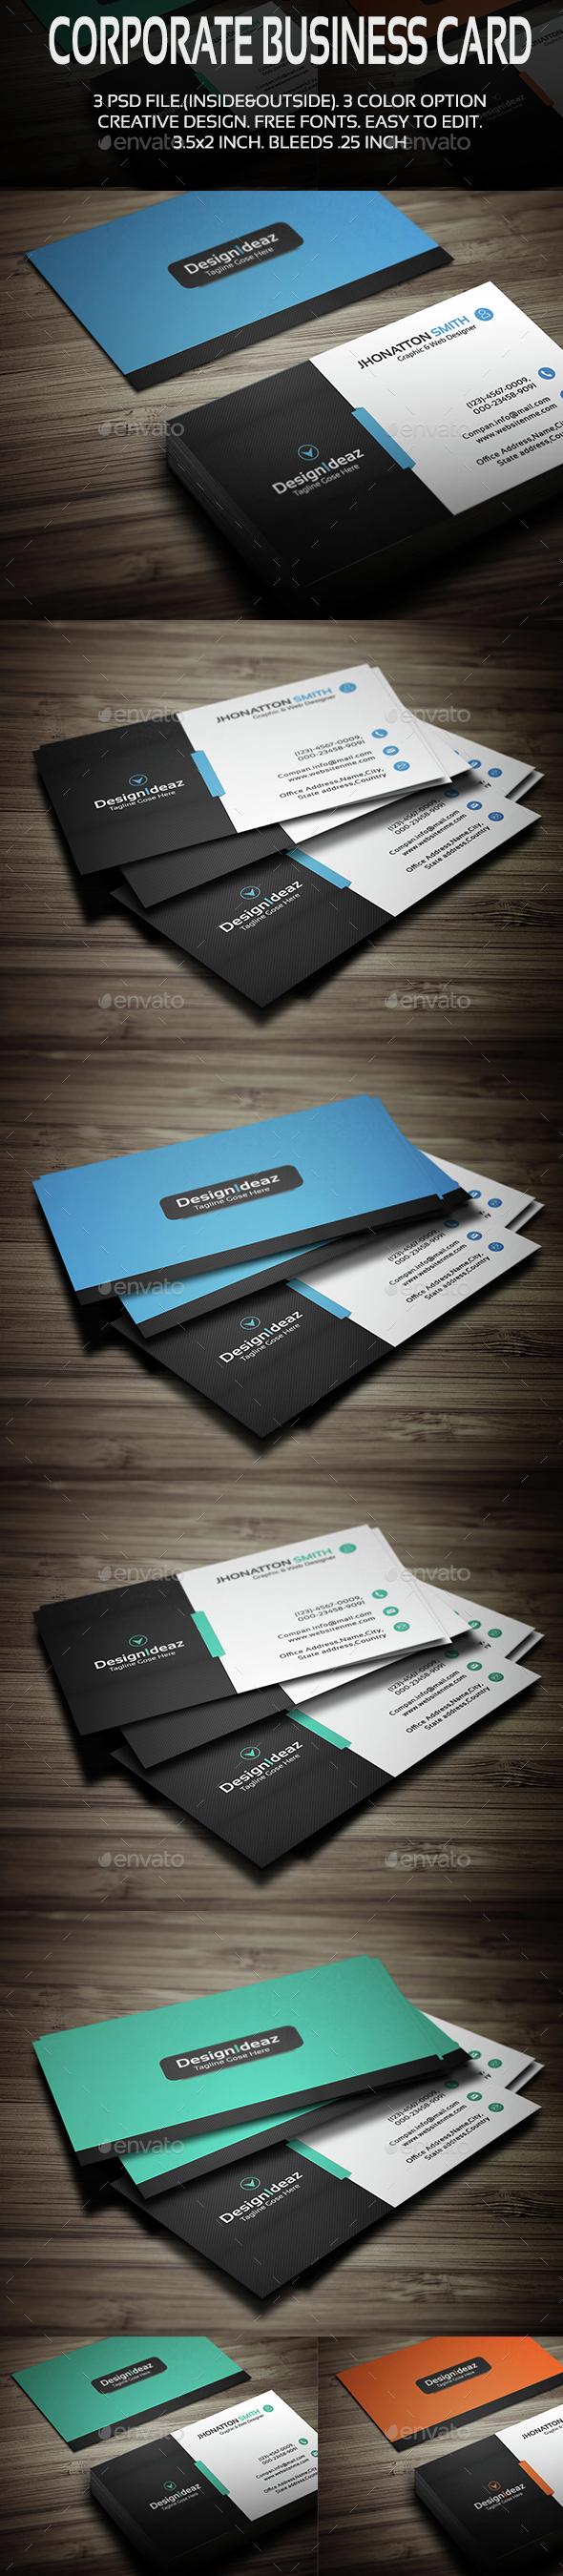 Corporate Business Card V02 - Corporate Business Cards